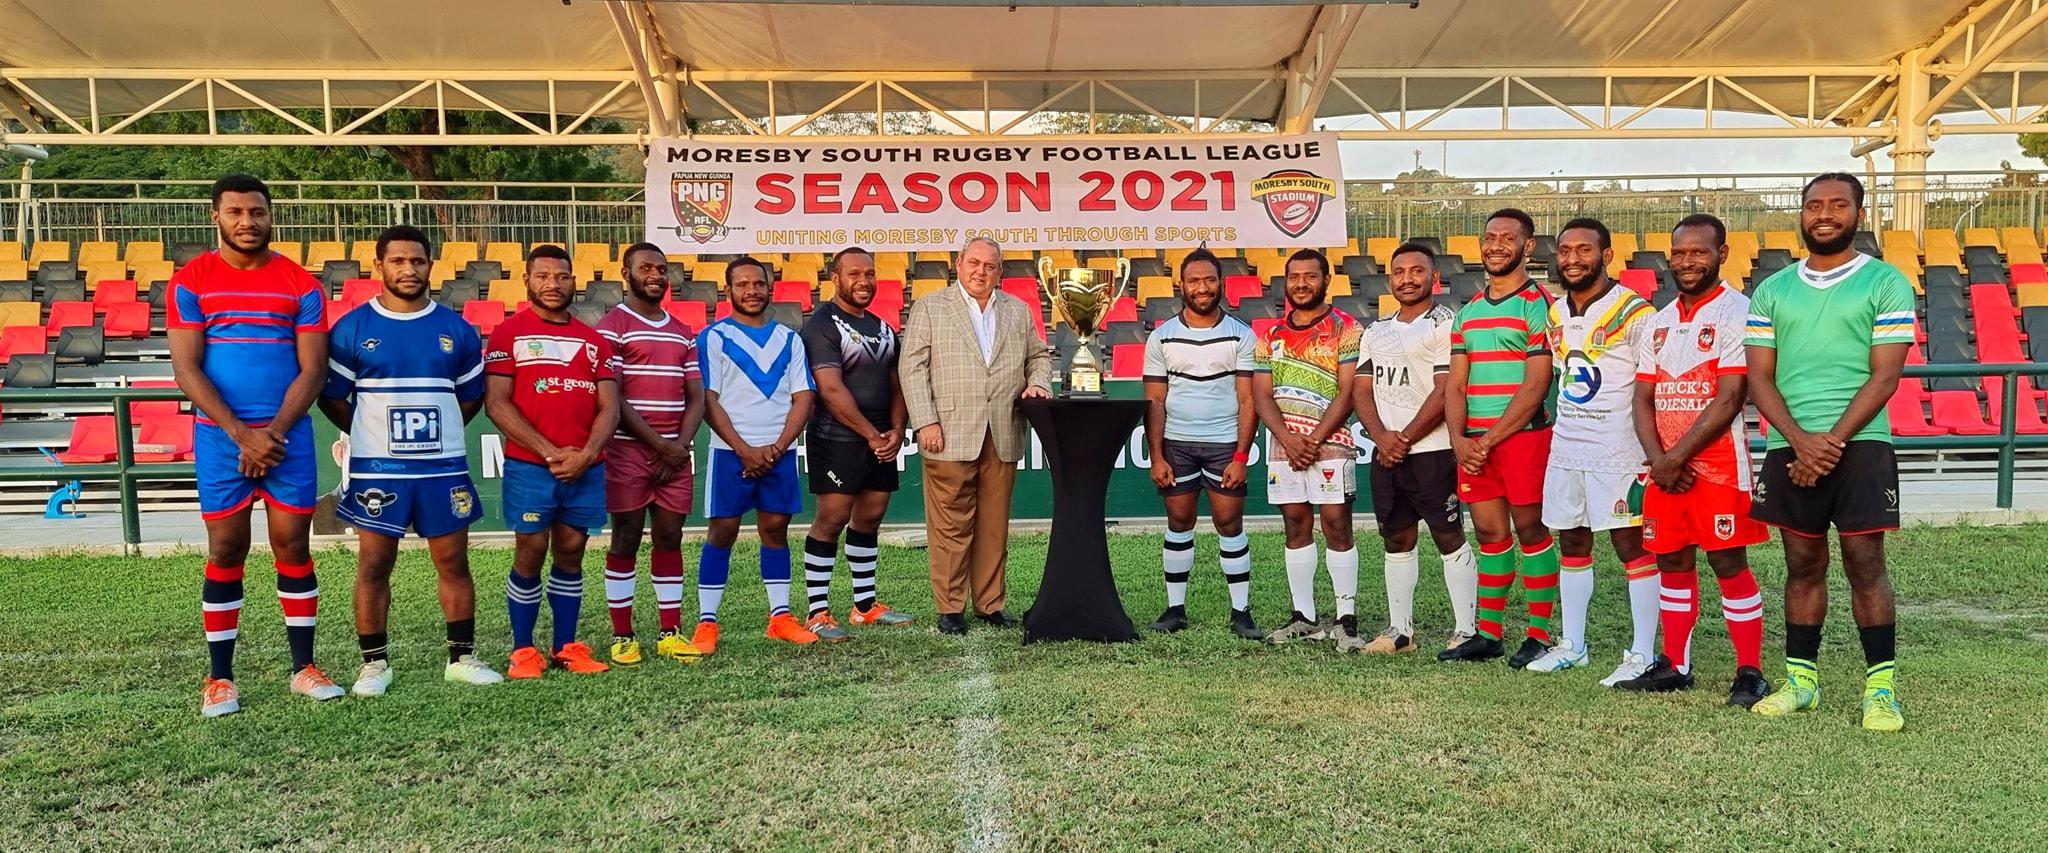 Moresby South Premiership set to kick off on May 21